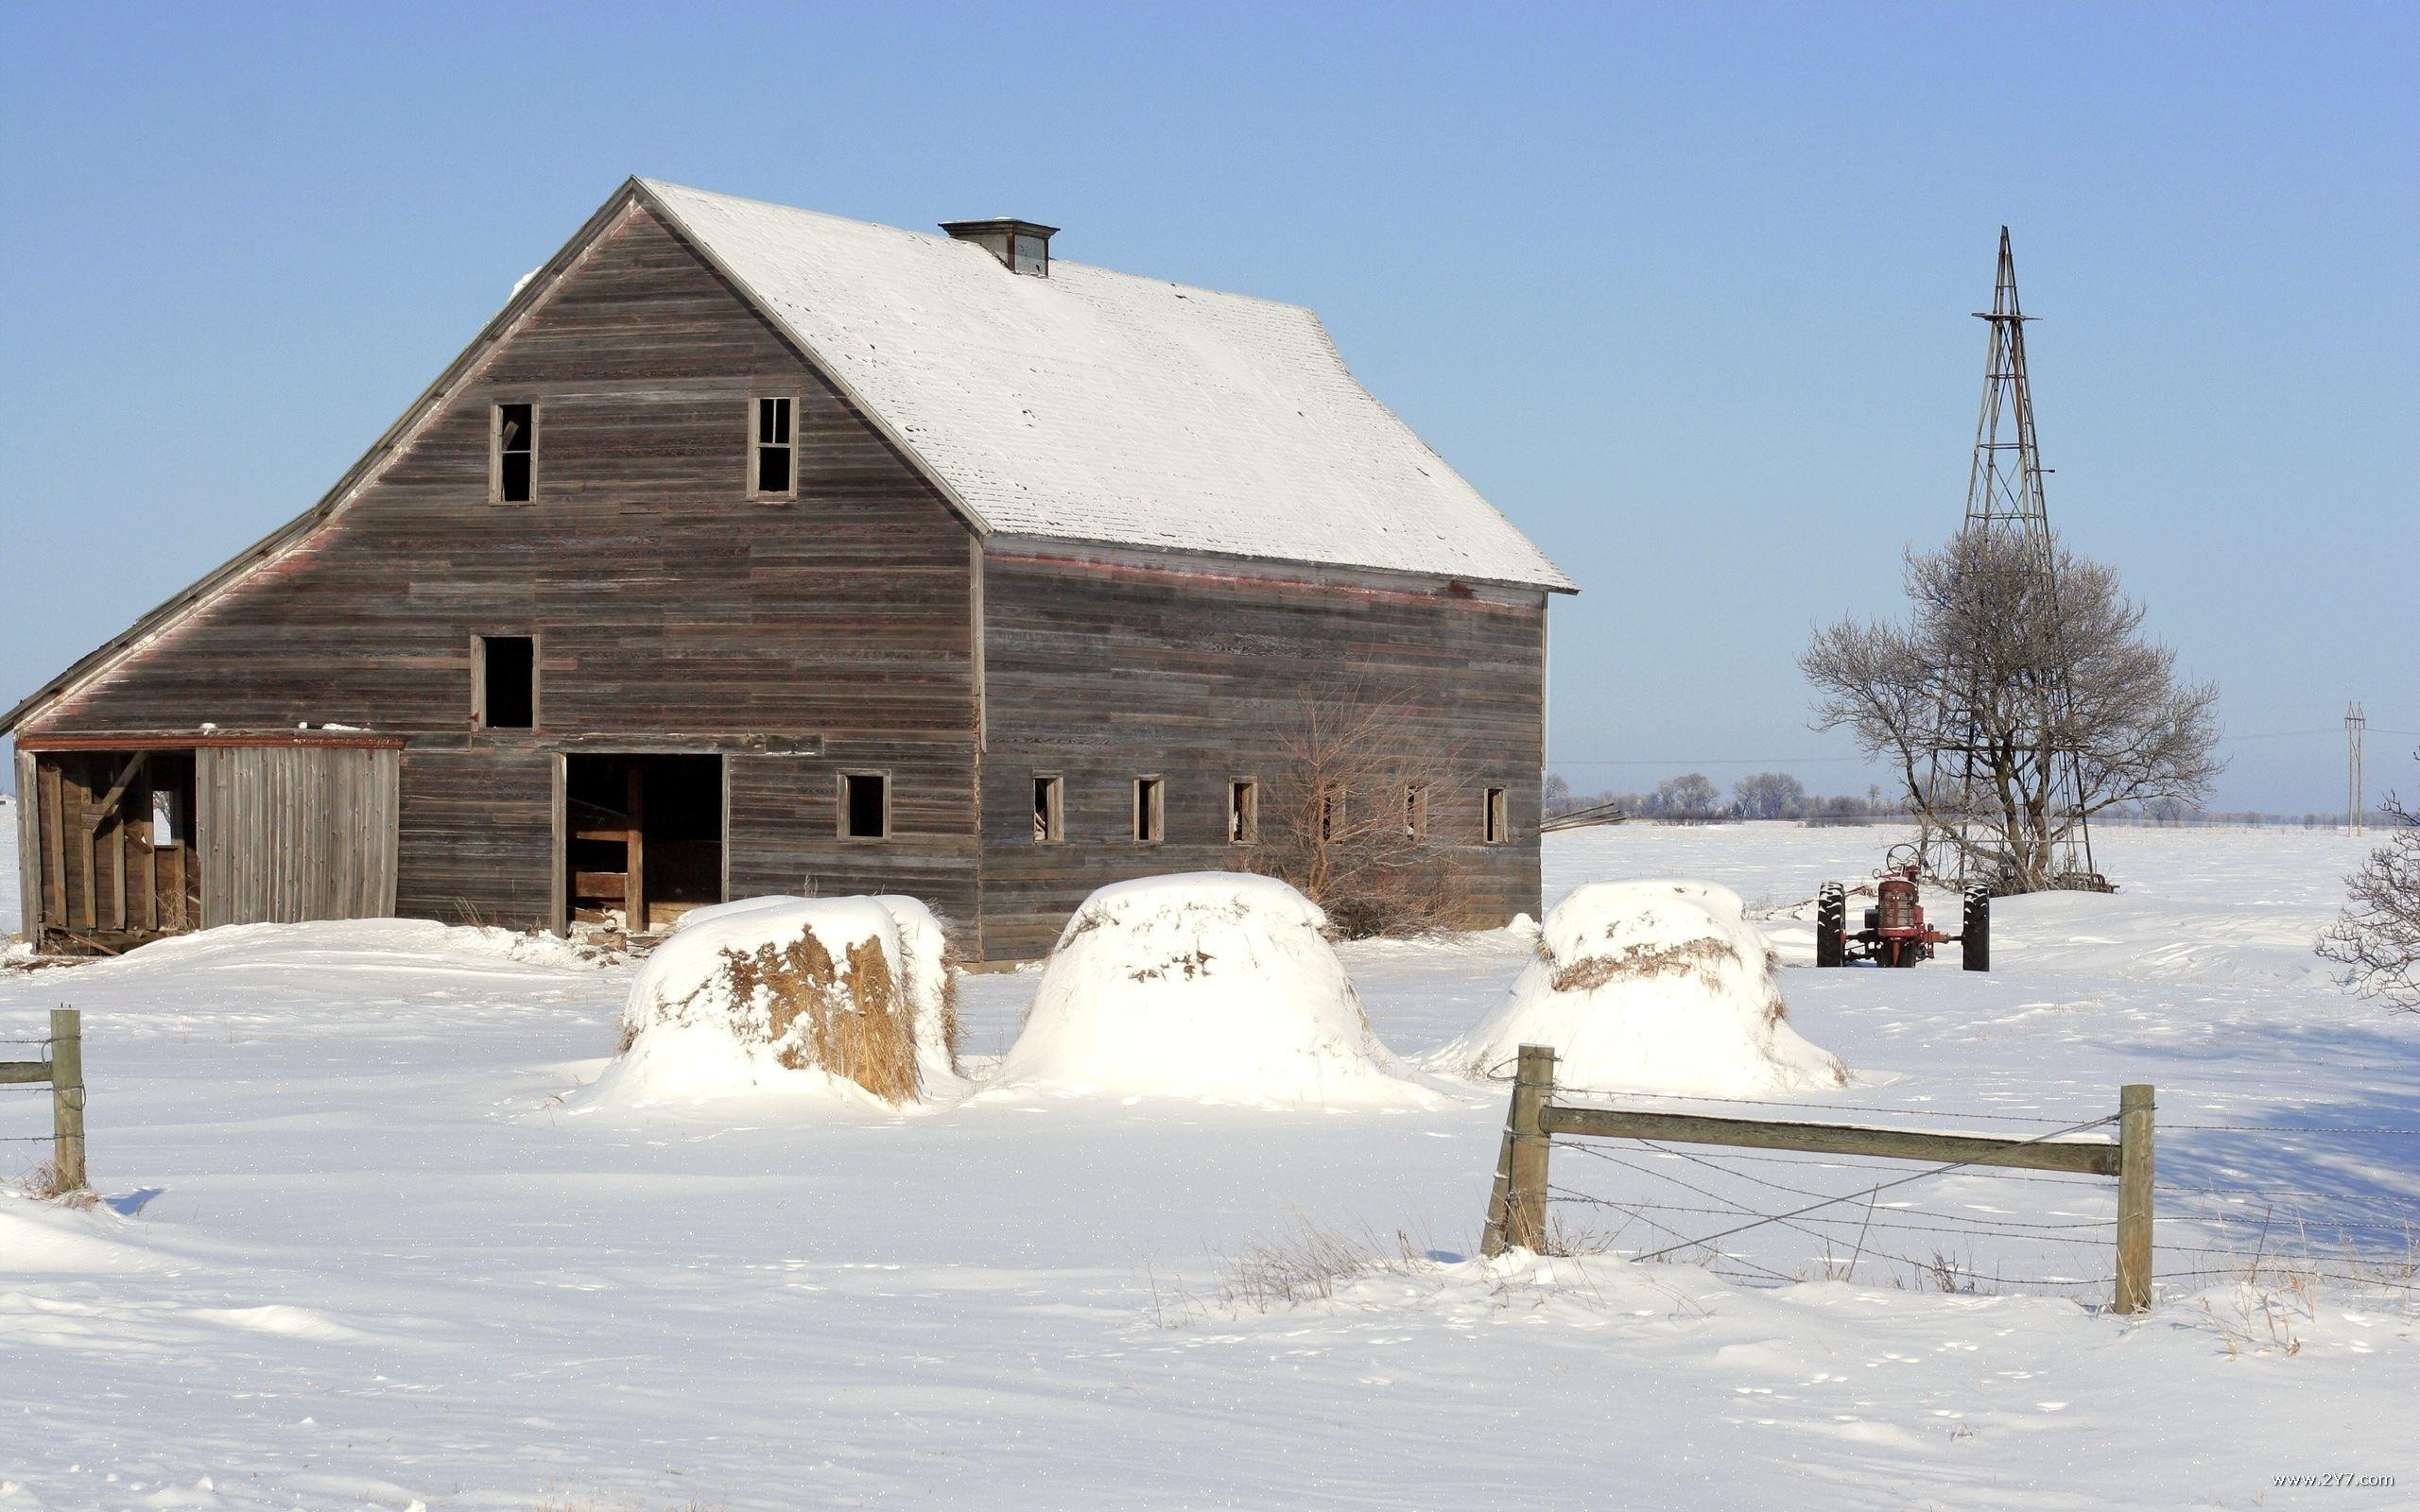 Snow Covered Barn Landscape Wallpaper 2560x1600 Wallpoper 152020 2560x1600